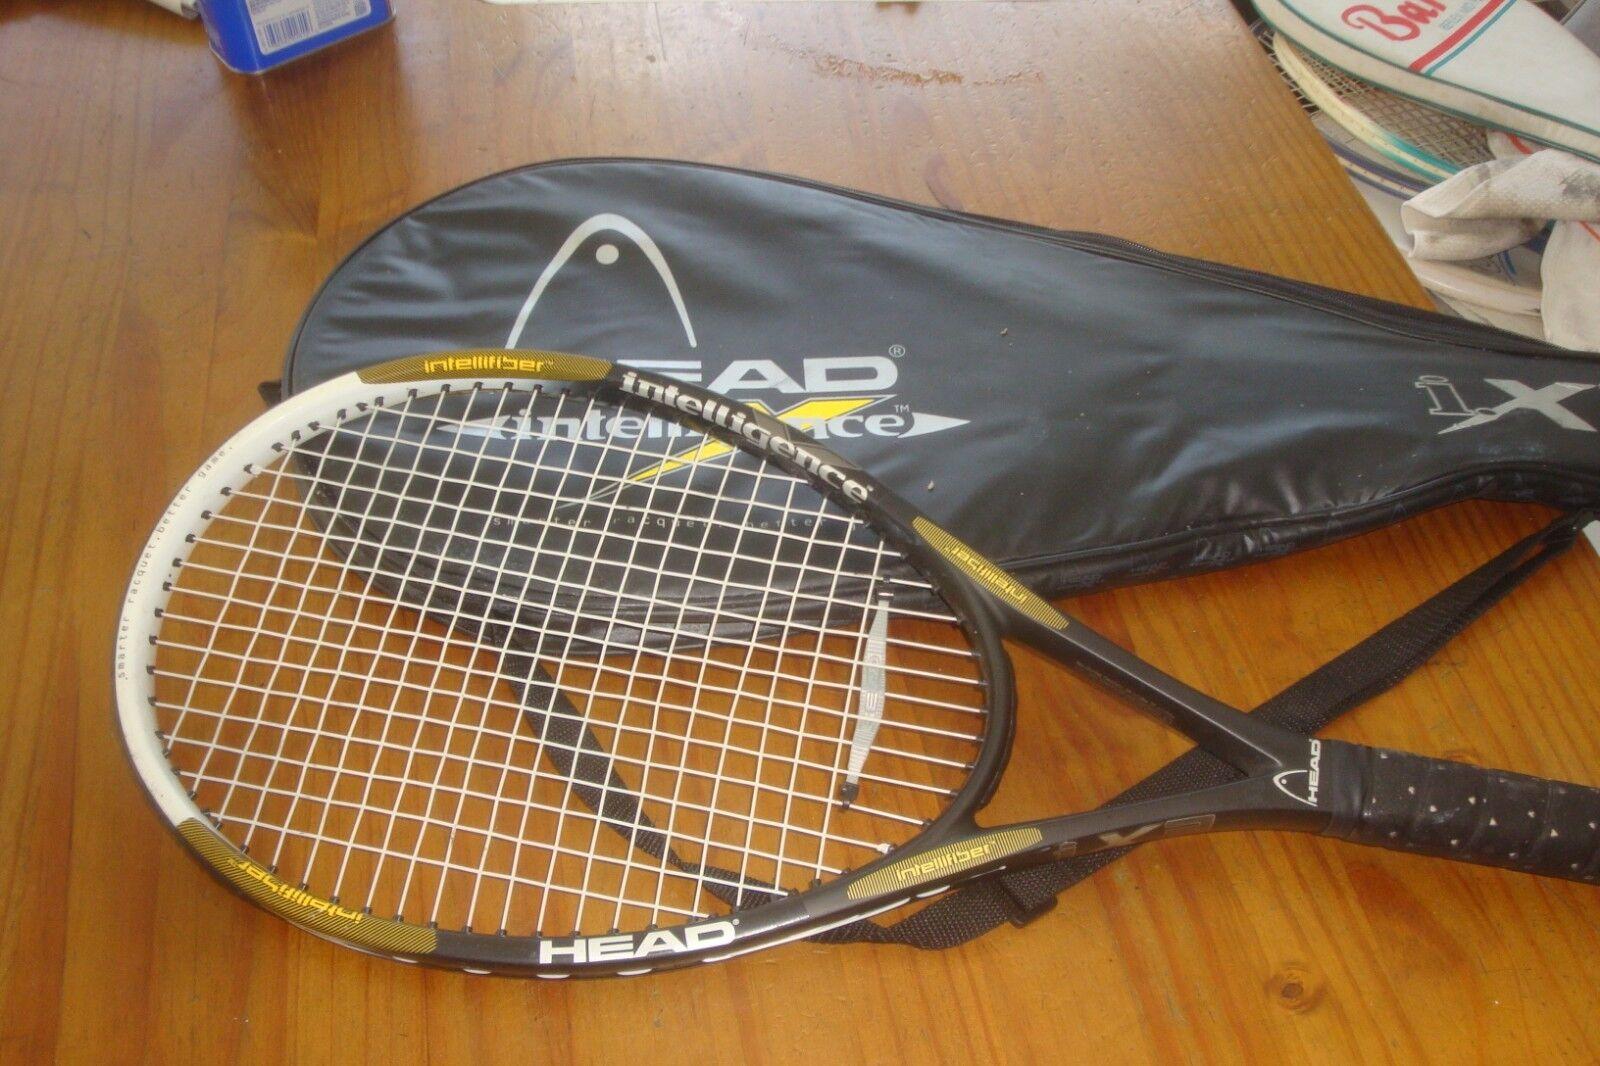 Jefe de  inteligencia intellifiber i.X3 Raqueta De Tenis Raqueta Mid Plus 4 1 2 Austria  popular